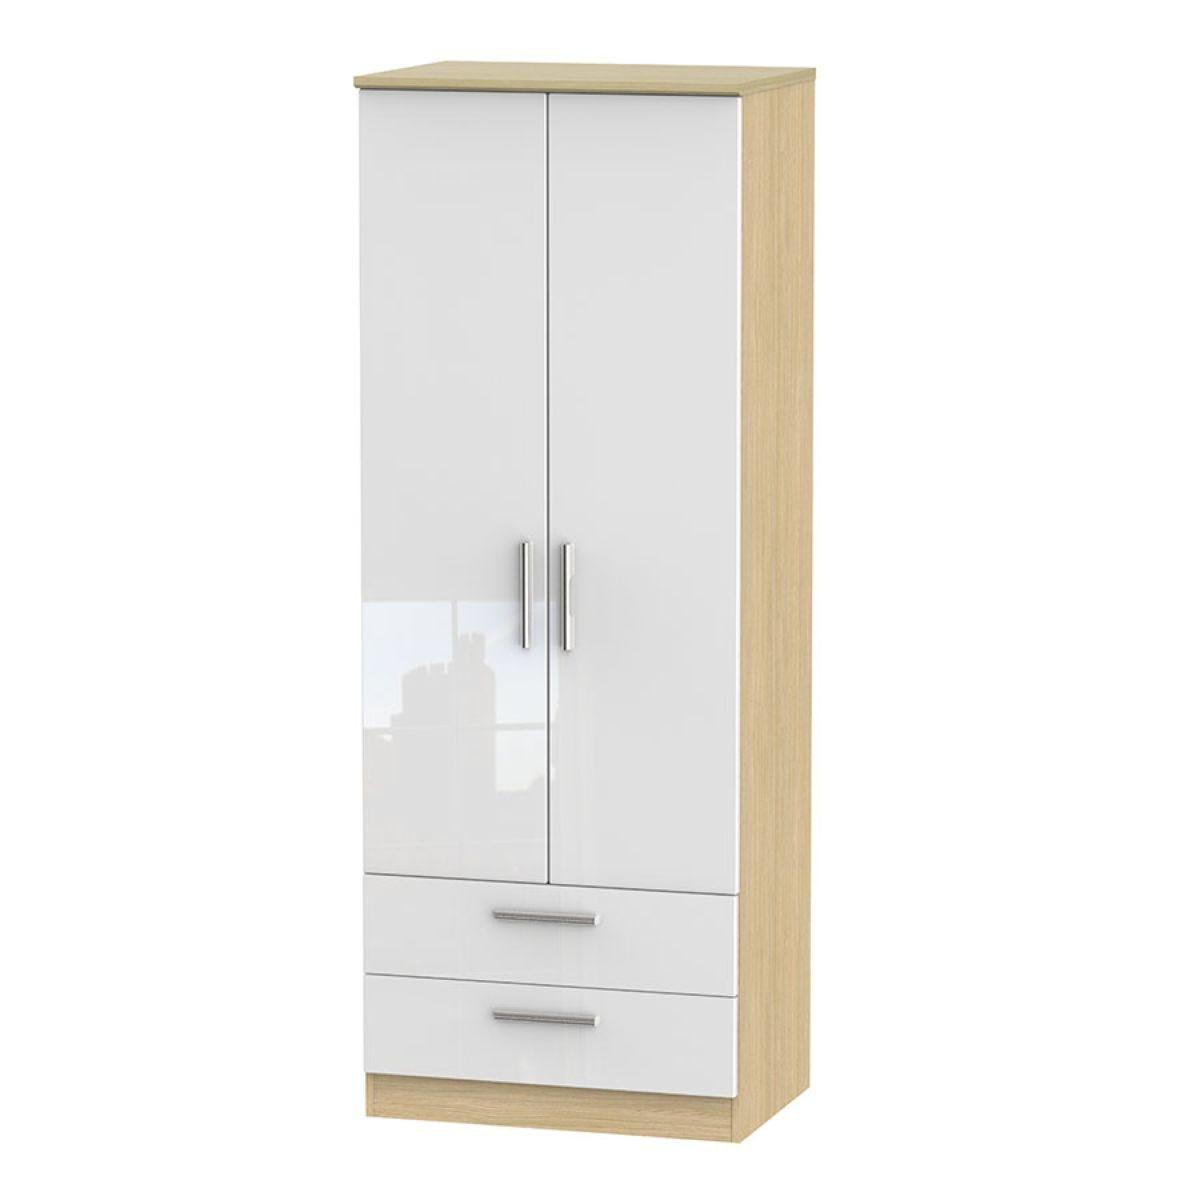 Kirkhill Tall 2-Door Wardrobe with Drawers -White Oak